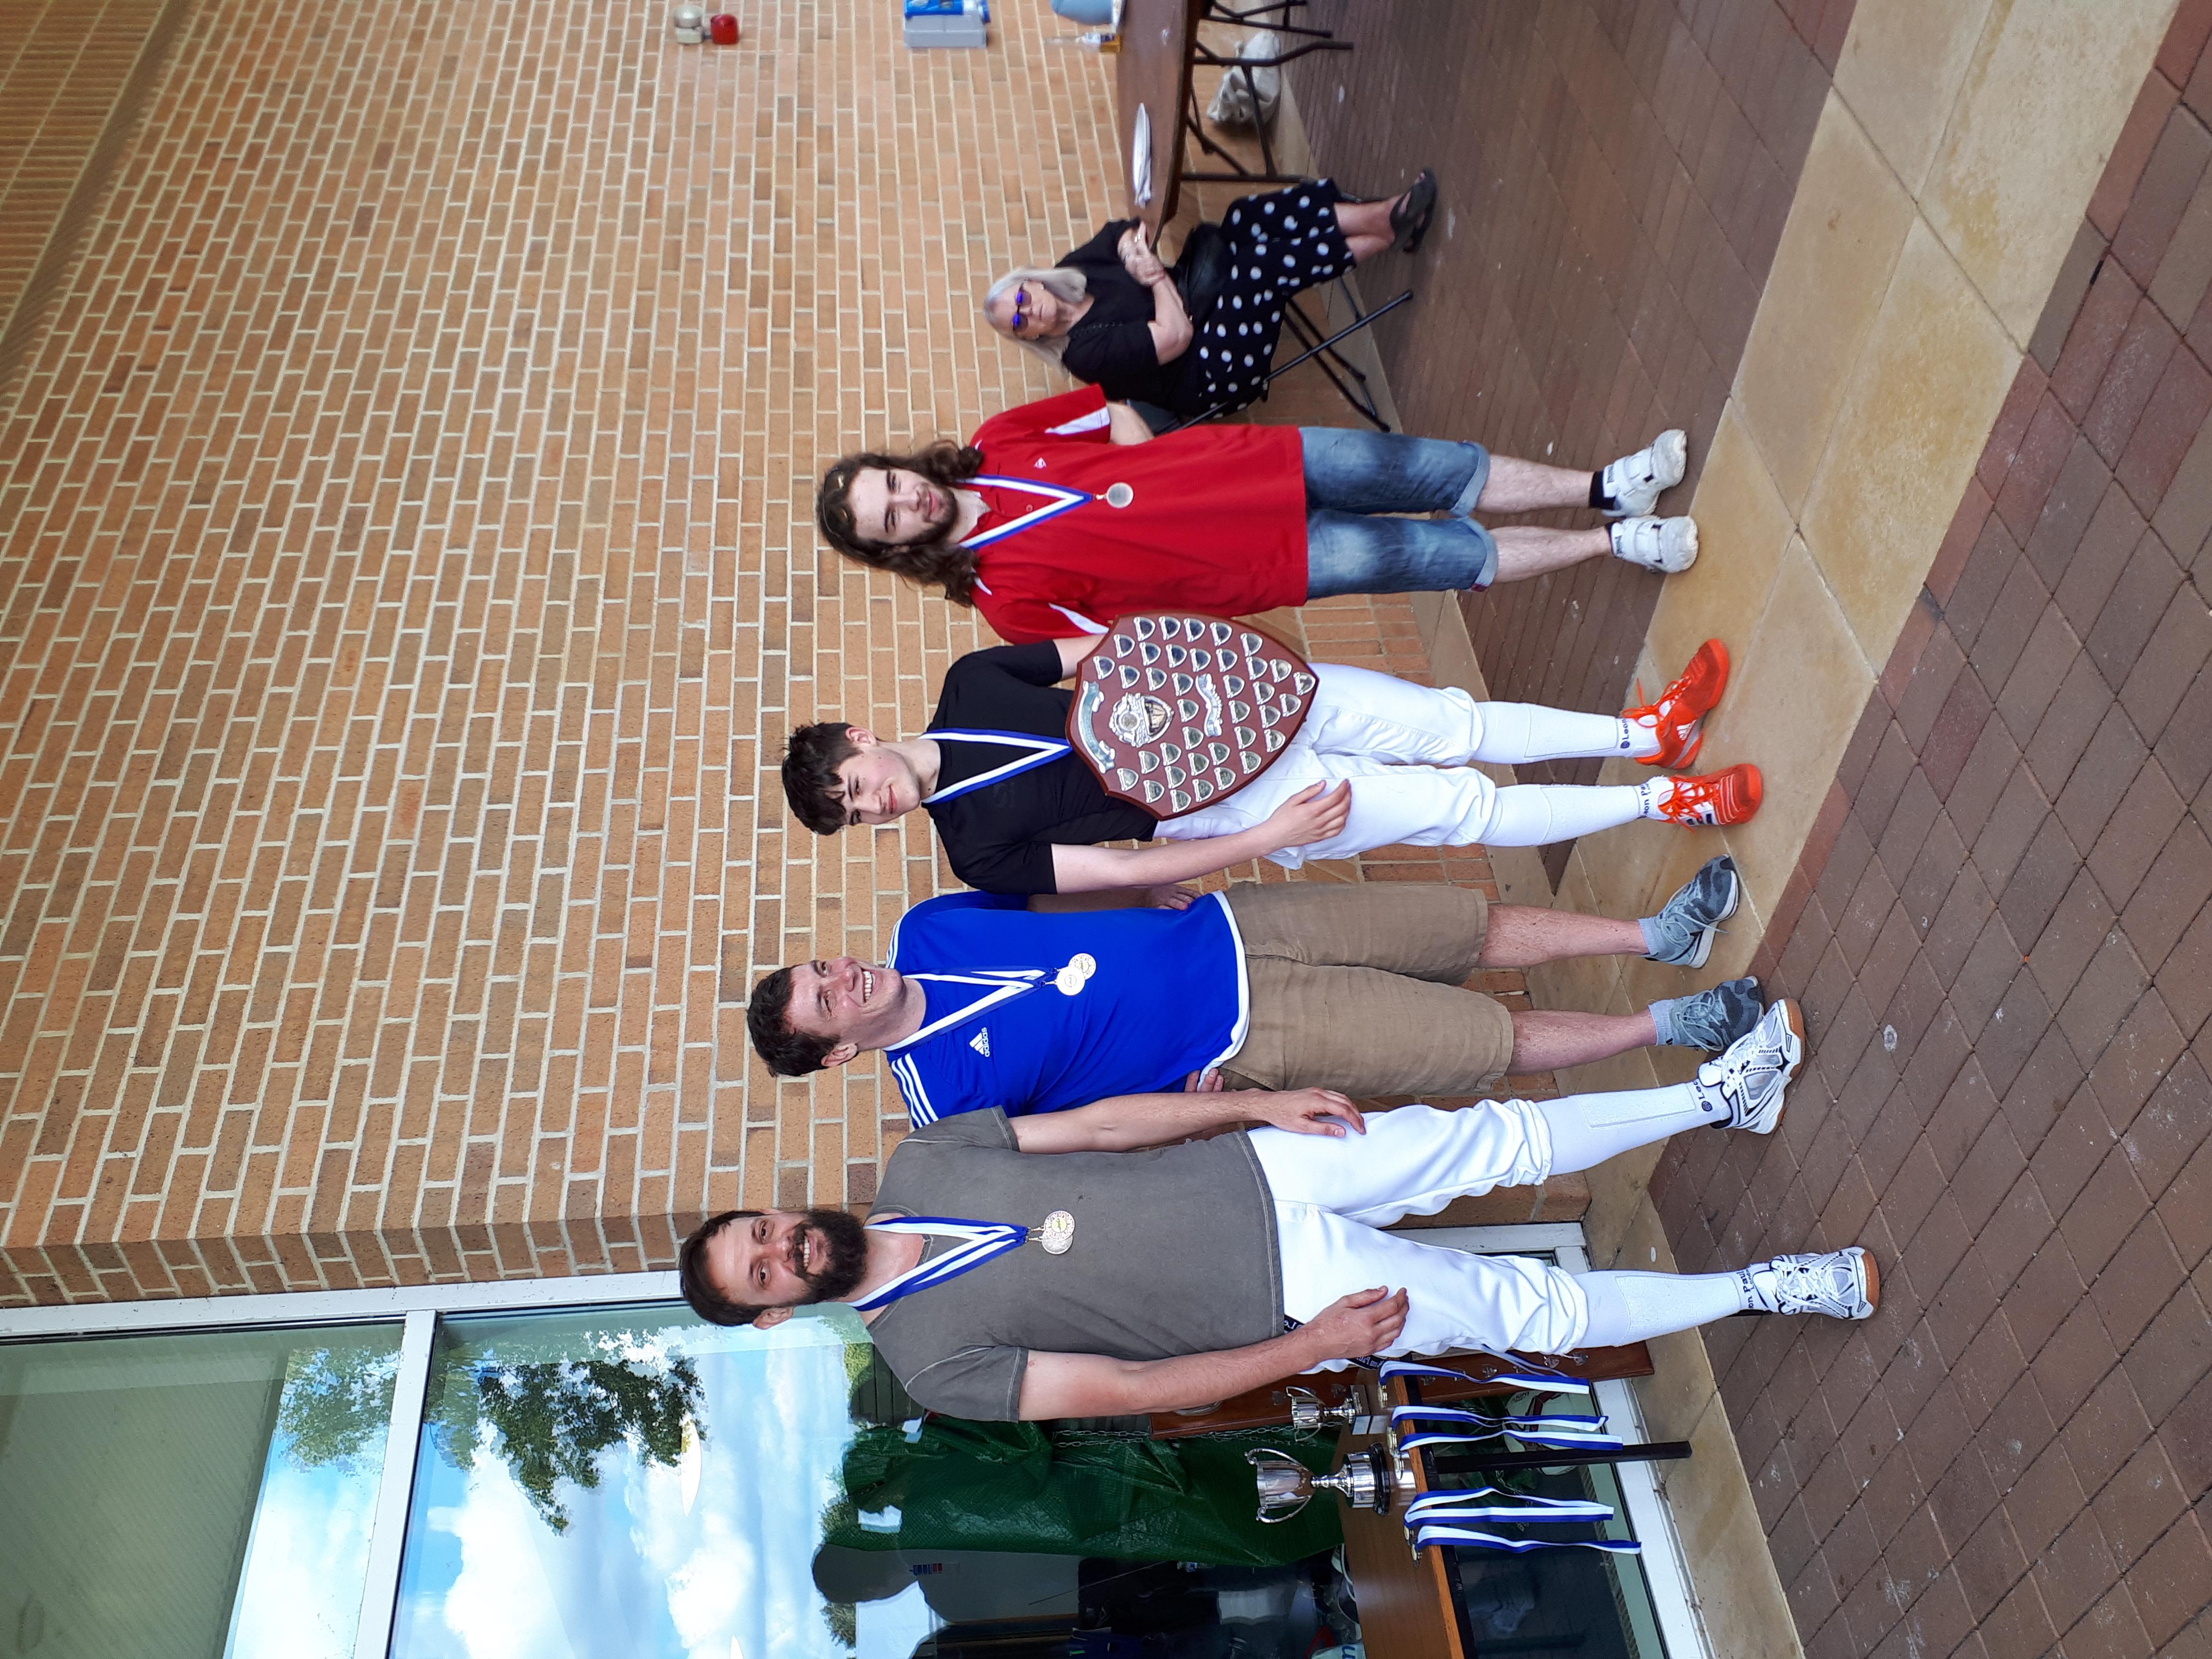 News Watford Fencing Club Based At Nuffield Health